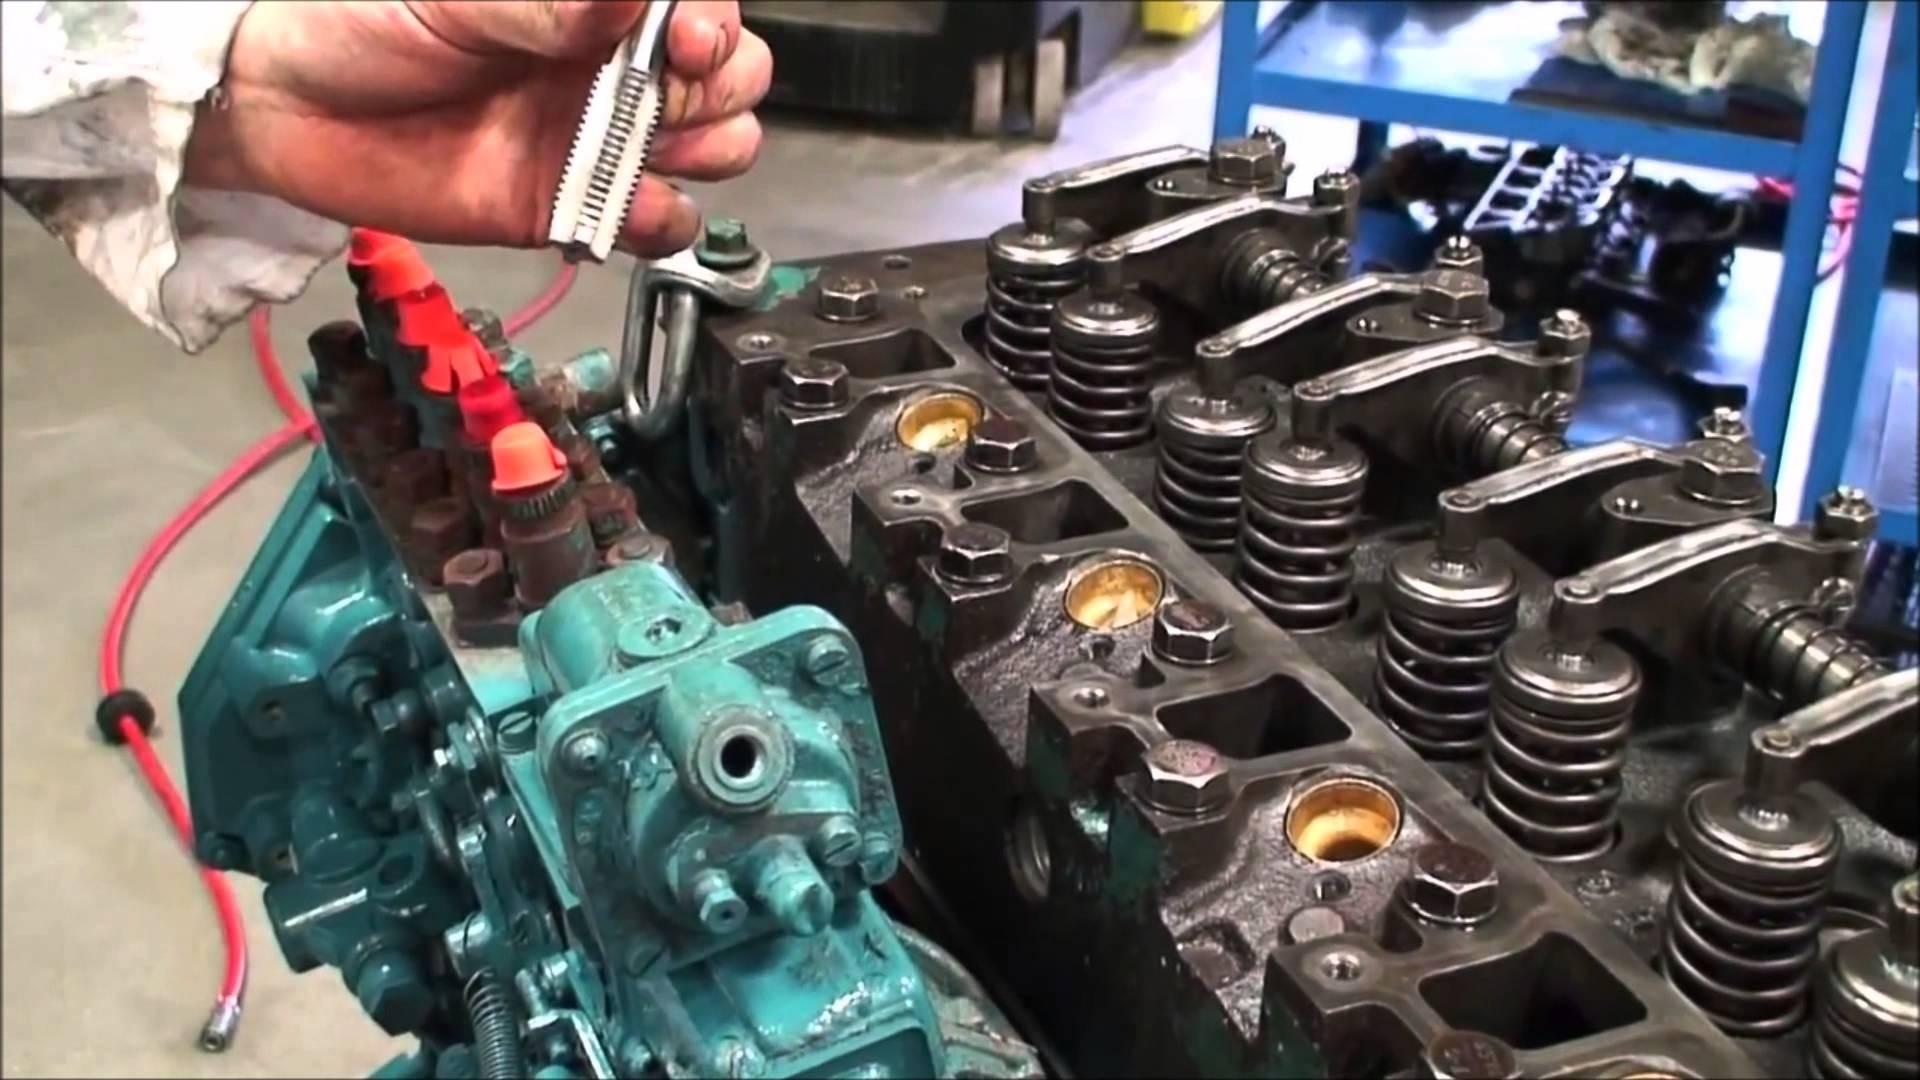 Cat C15 Engine Diagram Cat Injector Sleeve Removal Of Cat C15 Engine Diagram